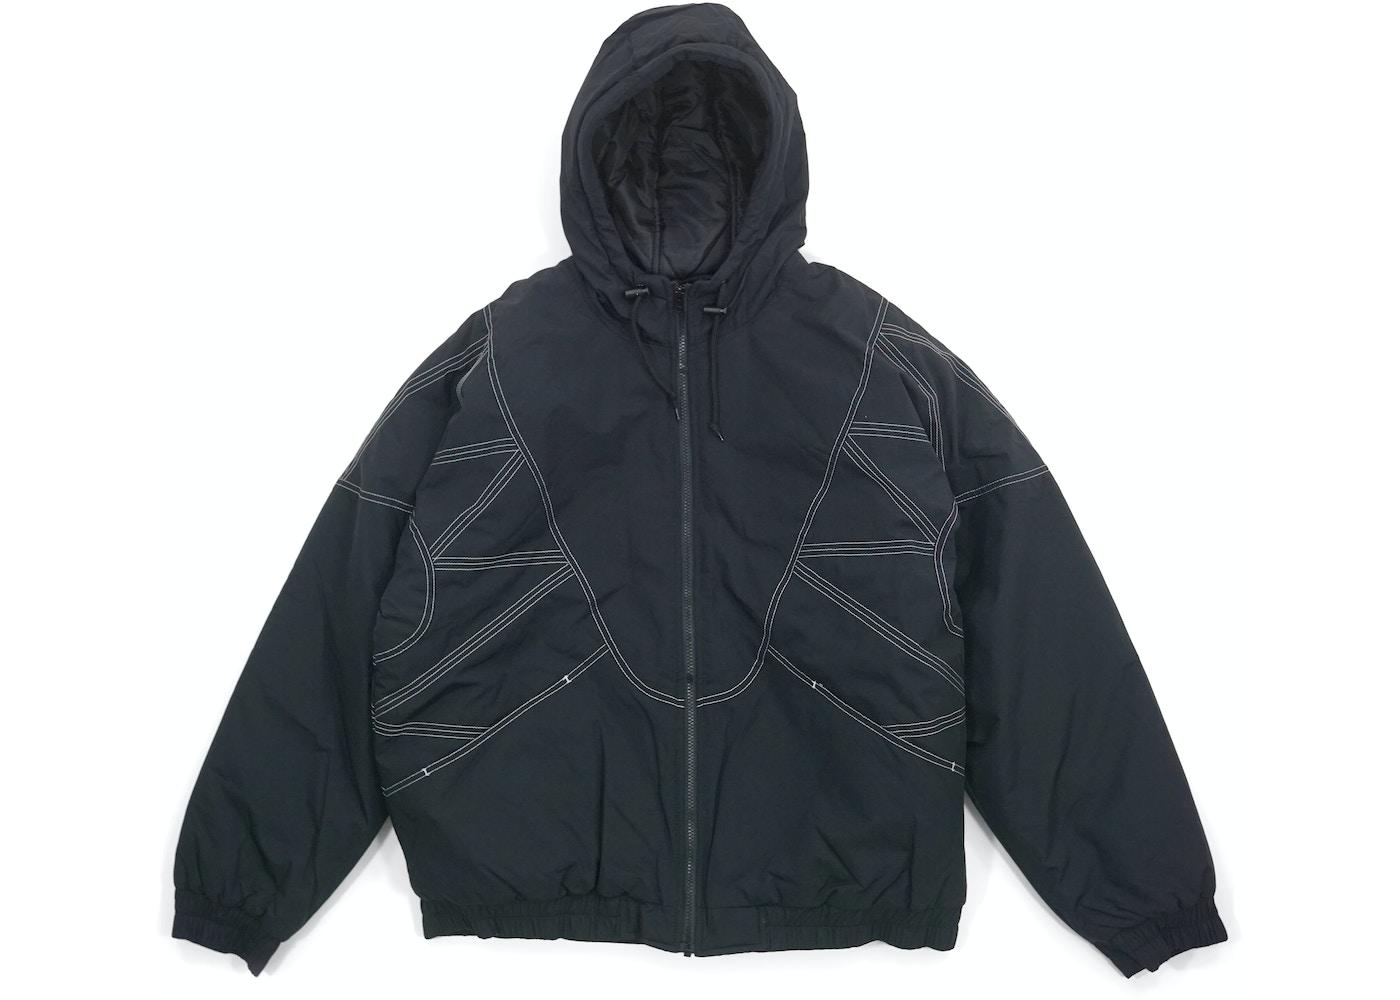 d8d45421 Supreme Zig Zag Stitch Puffy Jacket Black - FW18